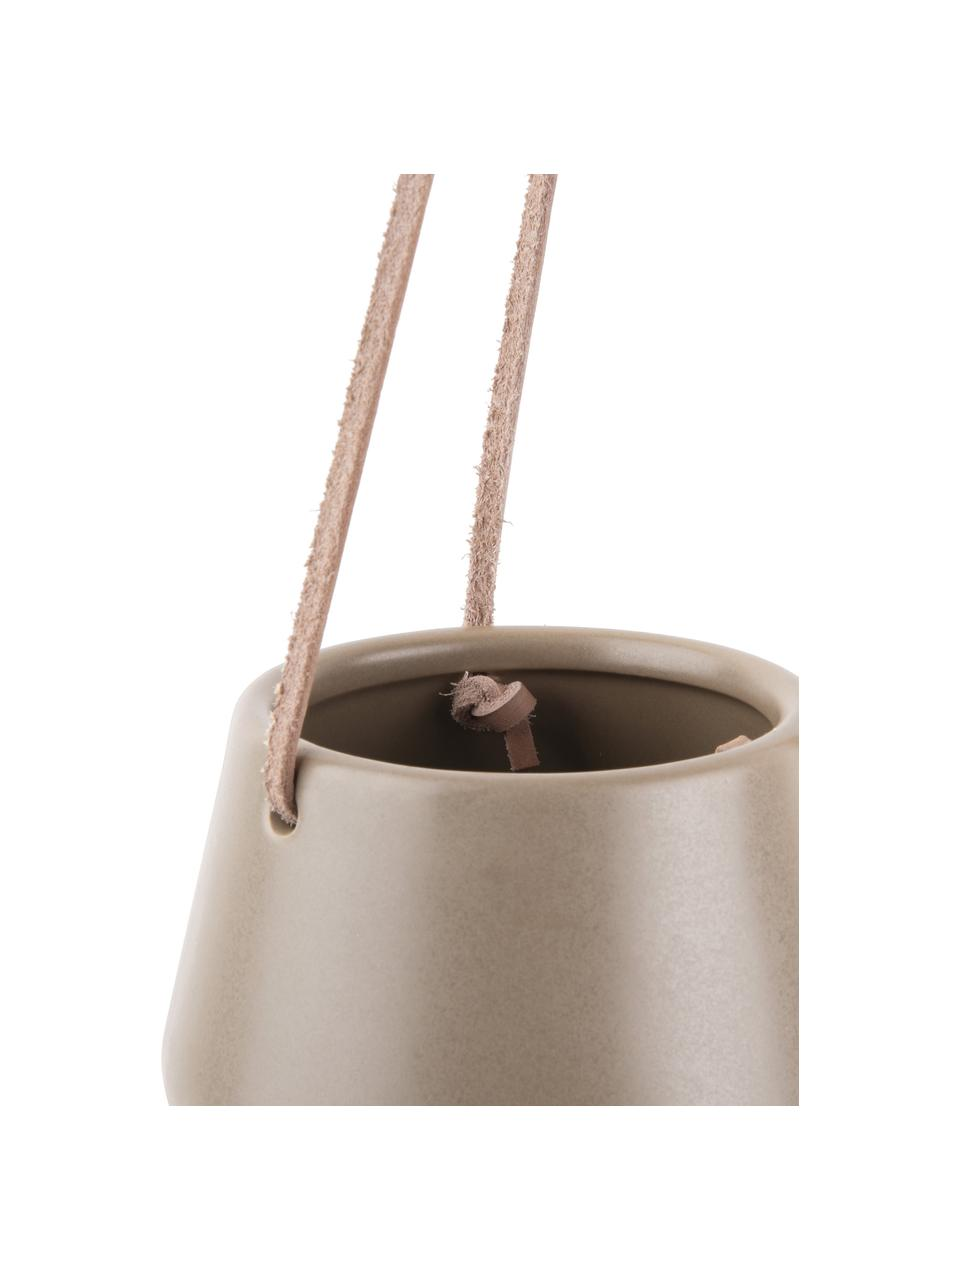 Hängender Übertopf Skittle aus Keramik, Keramik, Grau, Ø 12 x H 10 cm